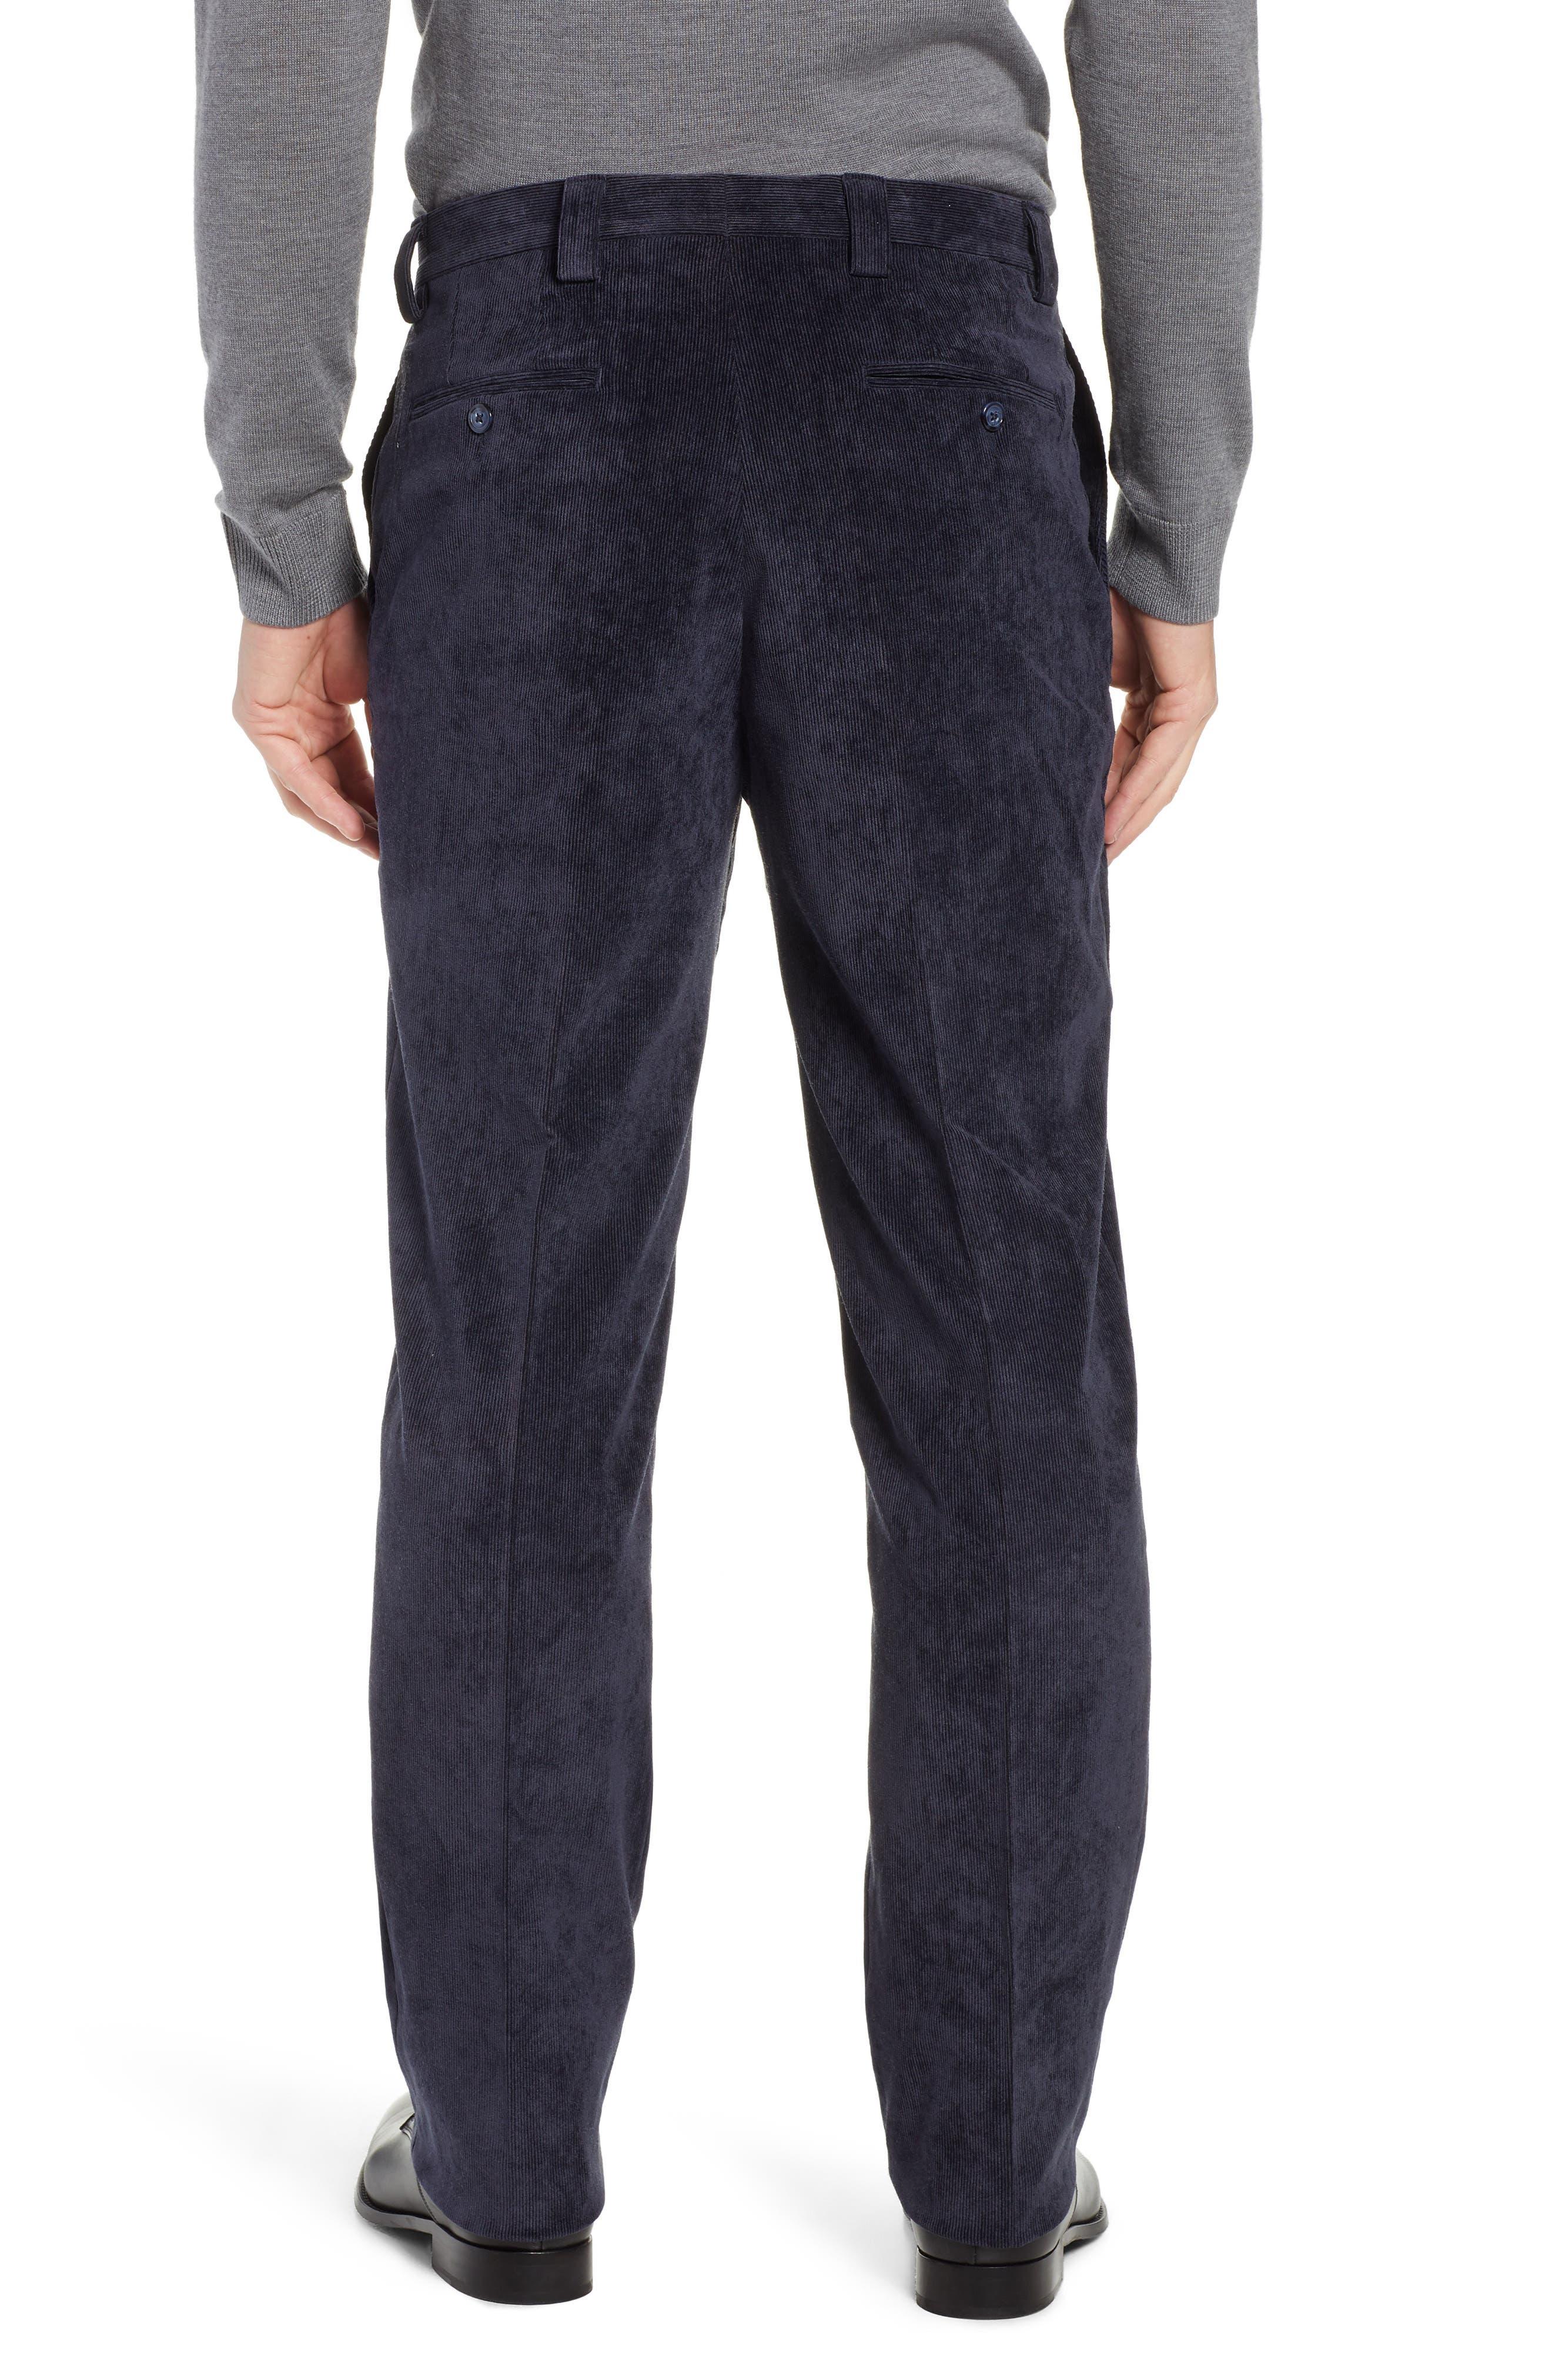 BERLE,                             Classic Fit Flat Front Corduroy Trousers,                             Alternate thumbnail 2, color,                             410